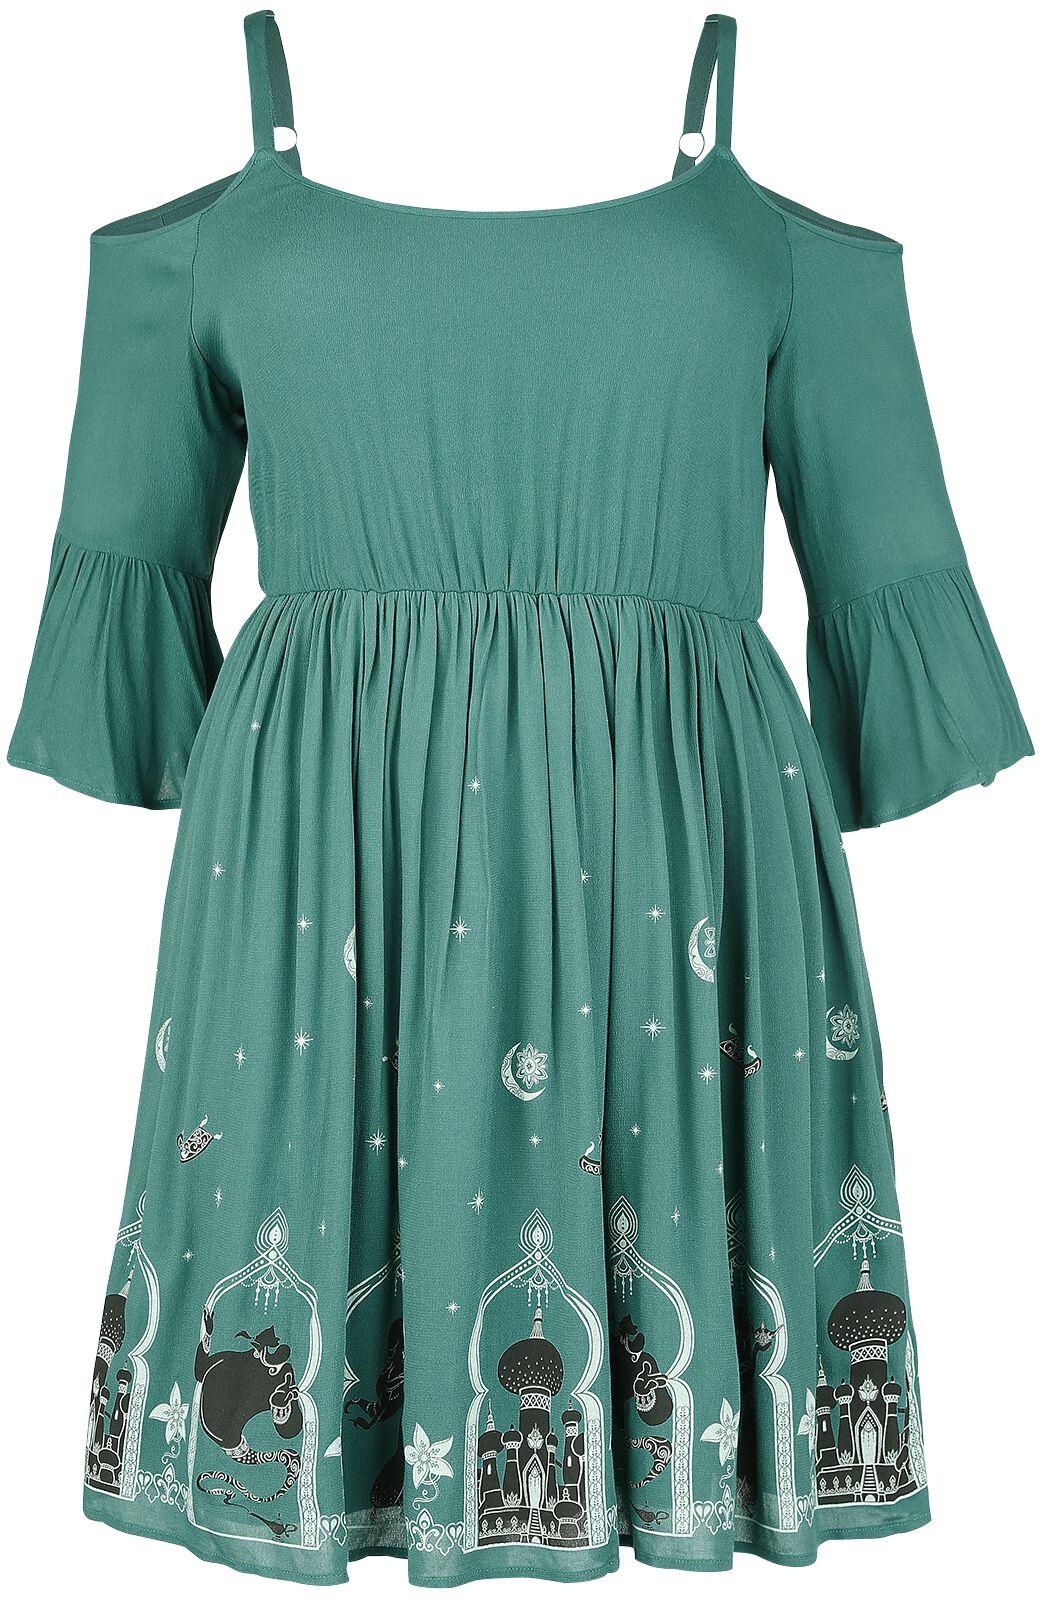 Merch dla Fanów - Sukienki - Sukienka Aladyn Agrabah Border Sukienka niebieski (Petrol) - 357807